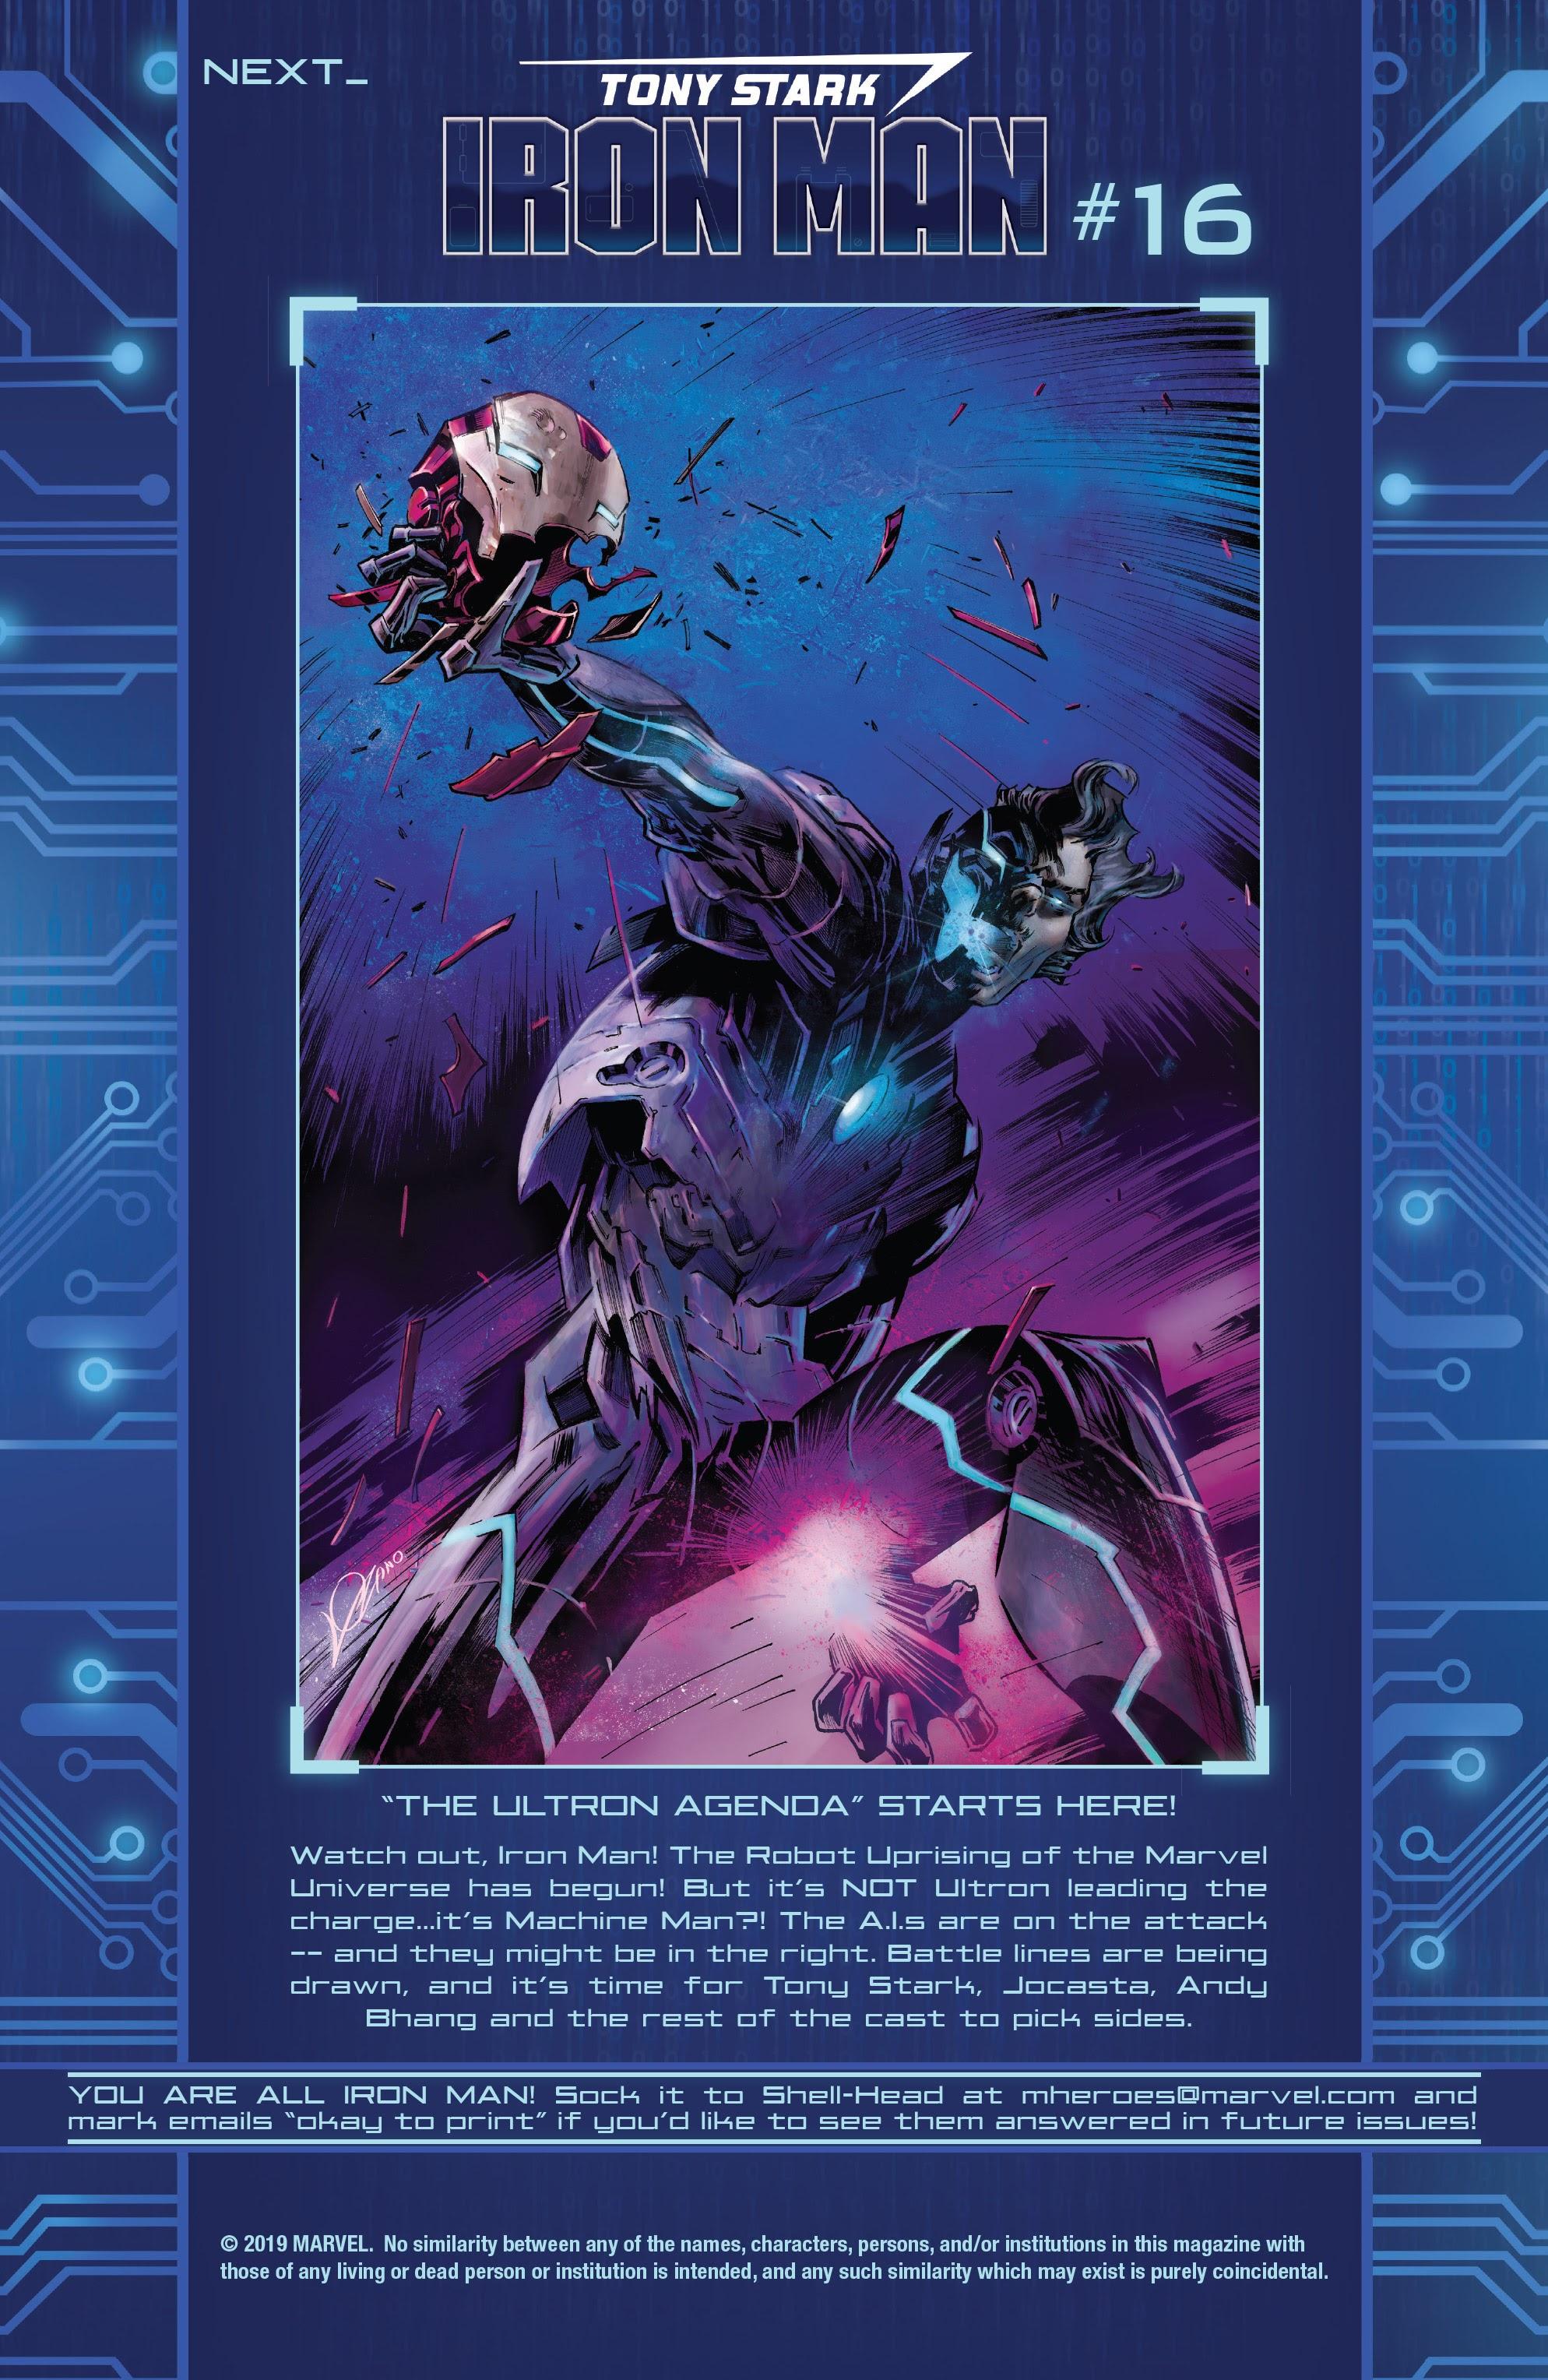 Read online Tony Stark: Iron Man comic -  Issue #15 - 23